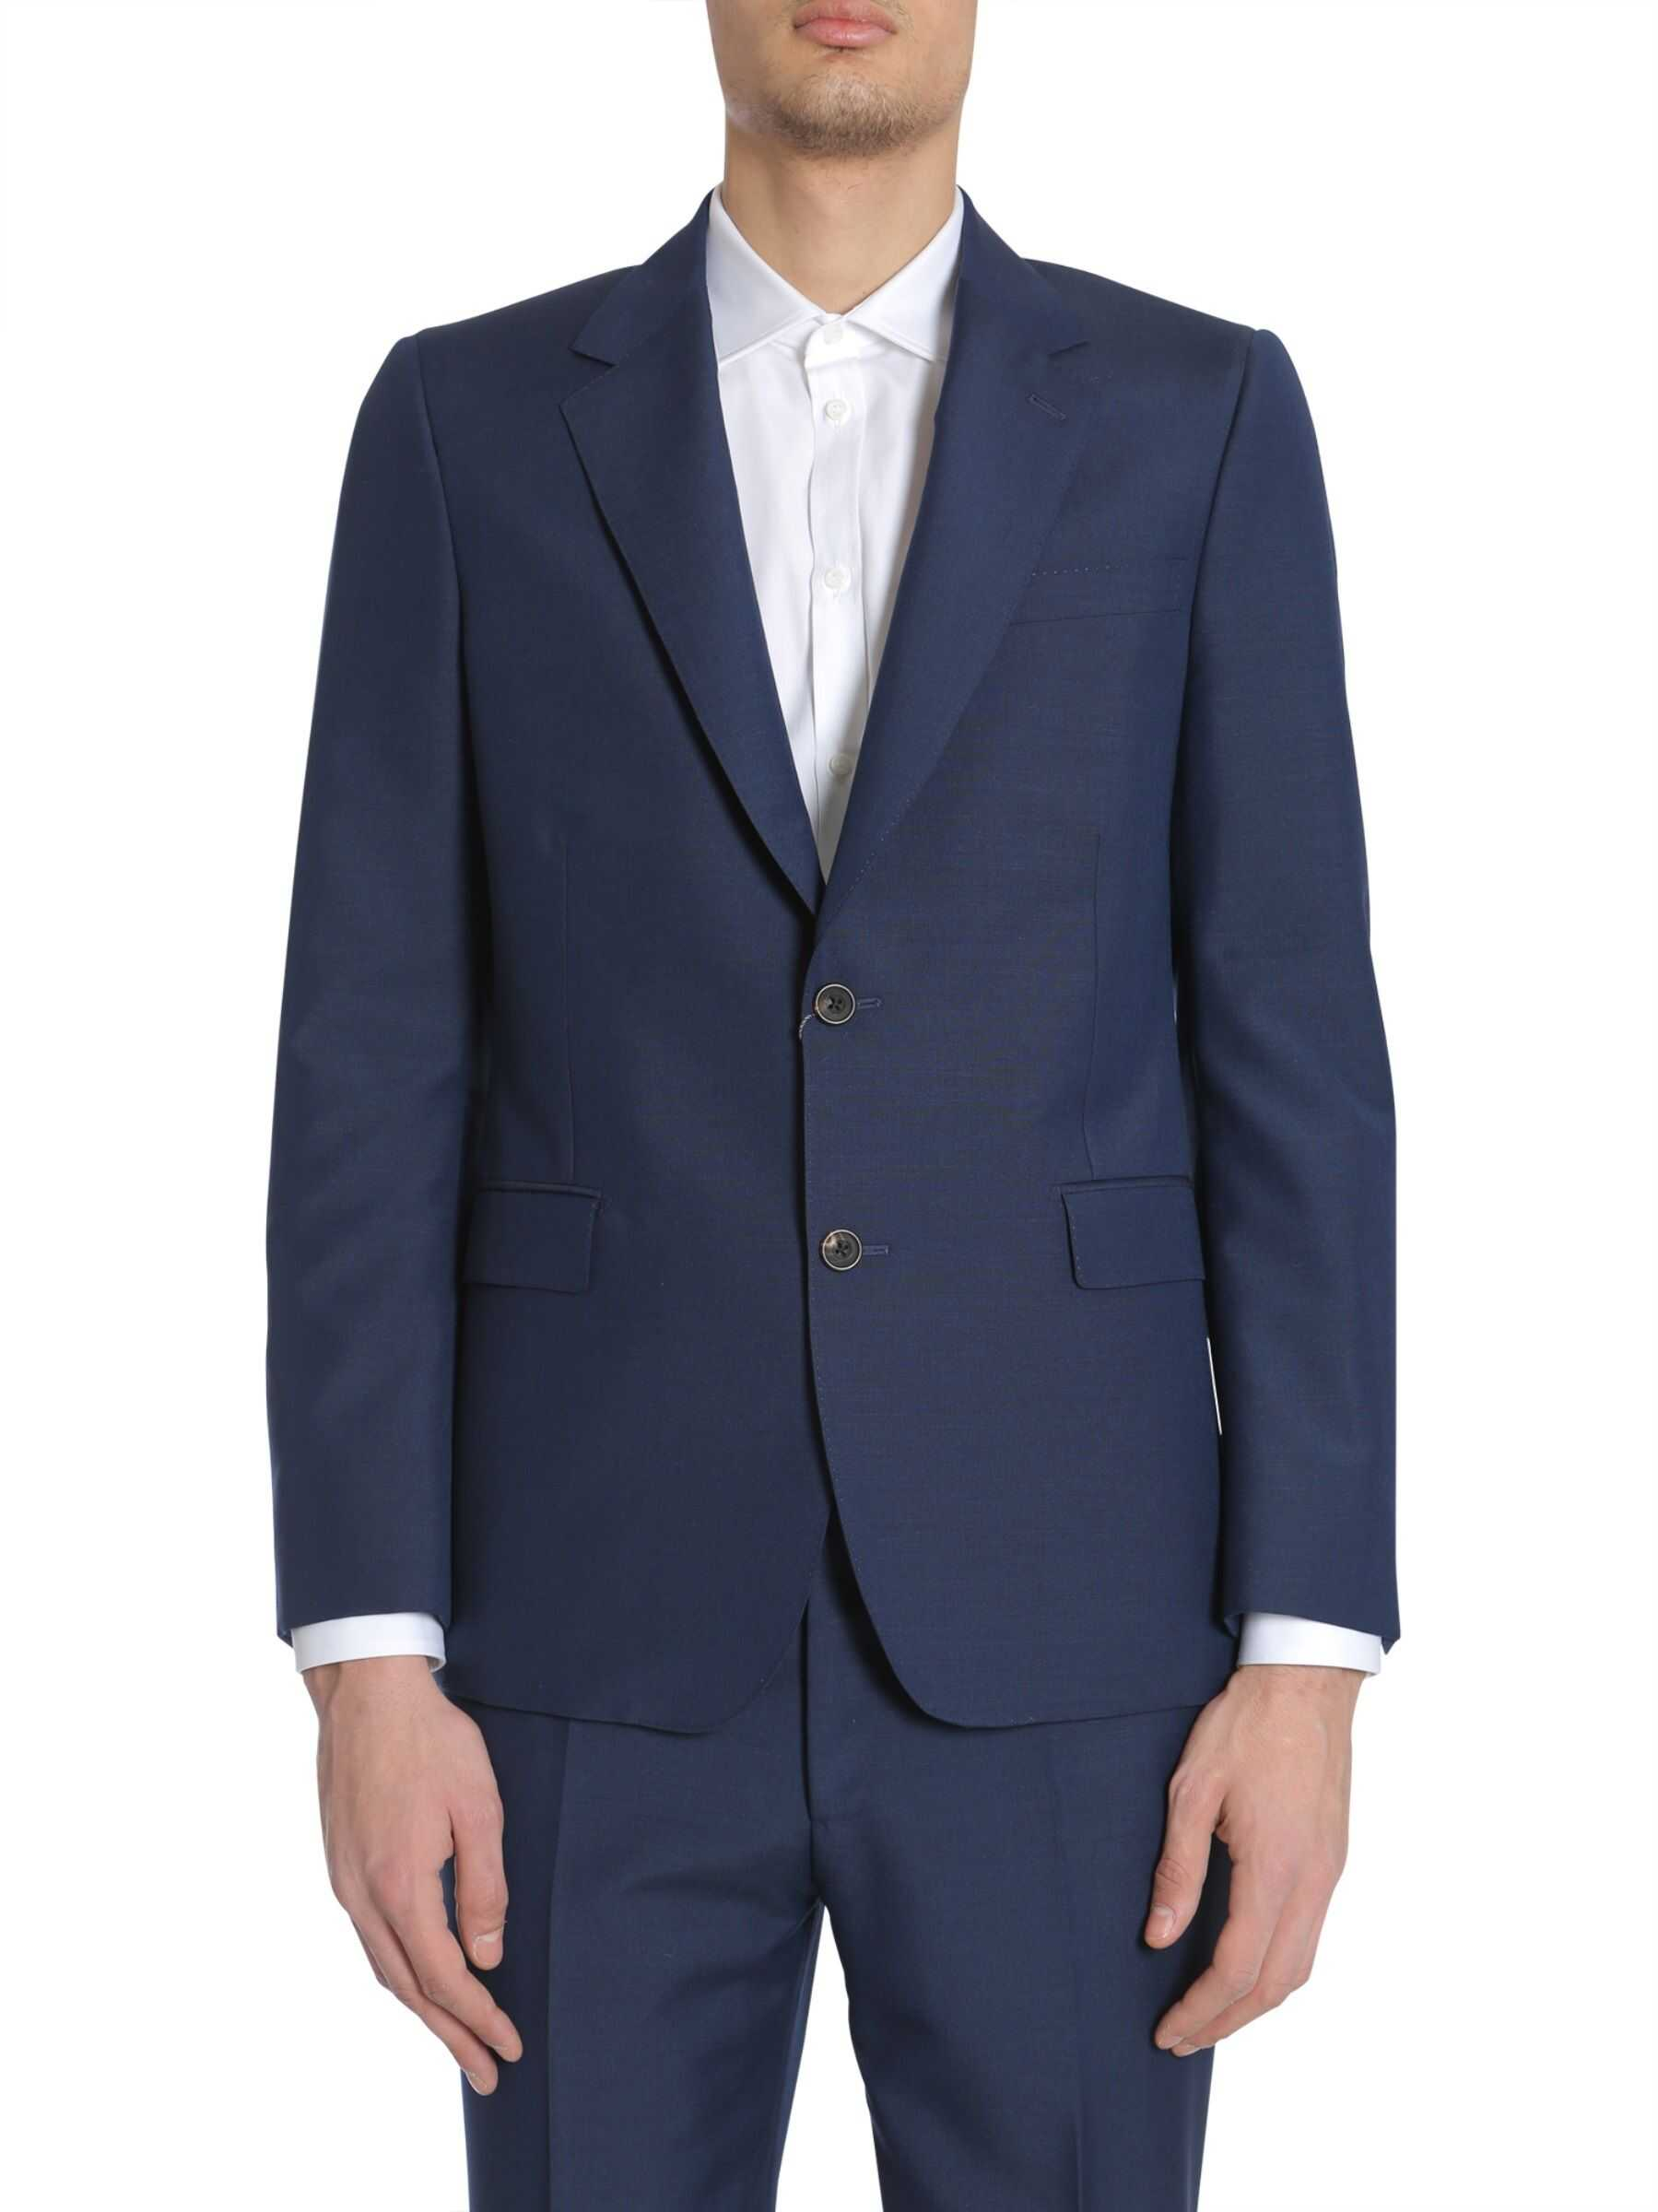 Alexander McQueen Tailored Jacket BLUE imagine